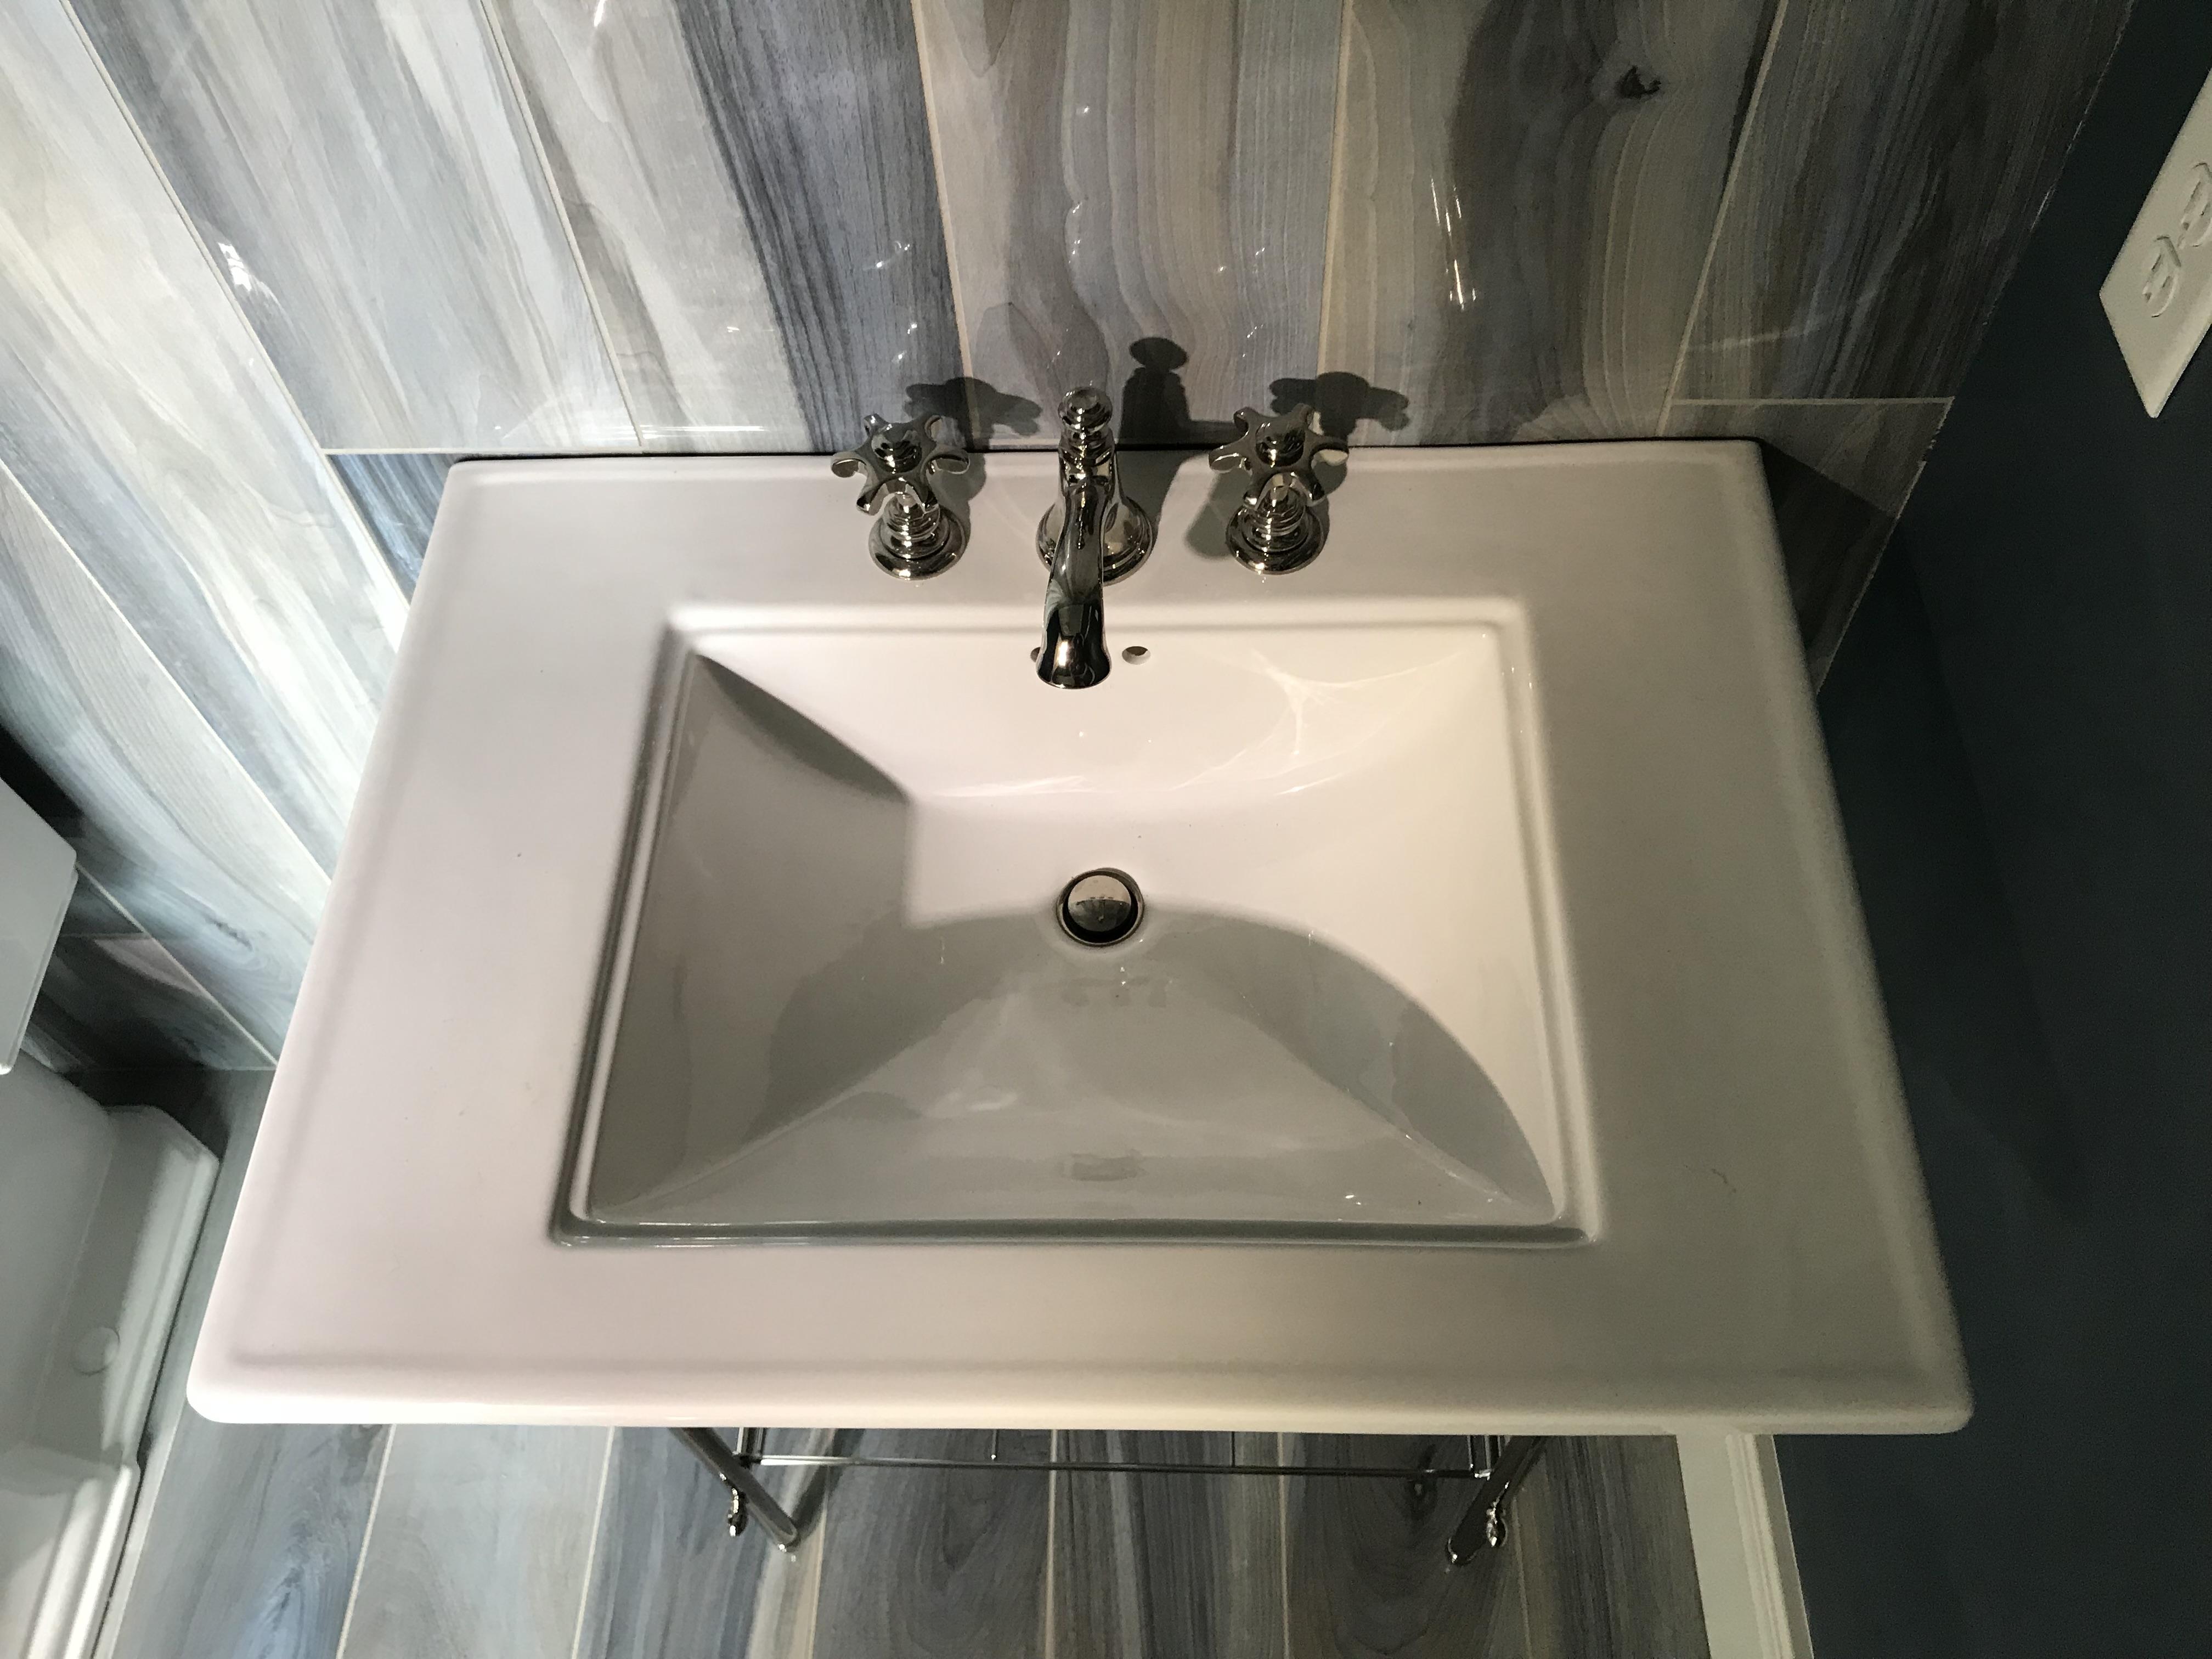 <div class='meta'><div class='origin-logo' data-origin='WTVD'></div><span class='caption-text' data-credit=''>Master bath sink</span></div>